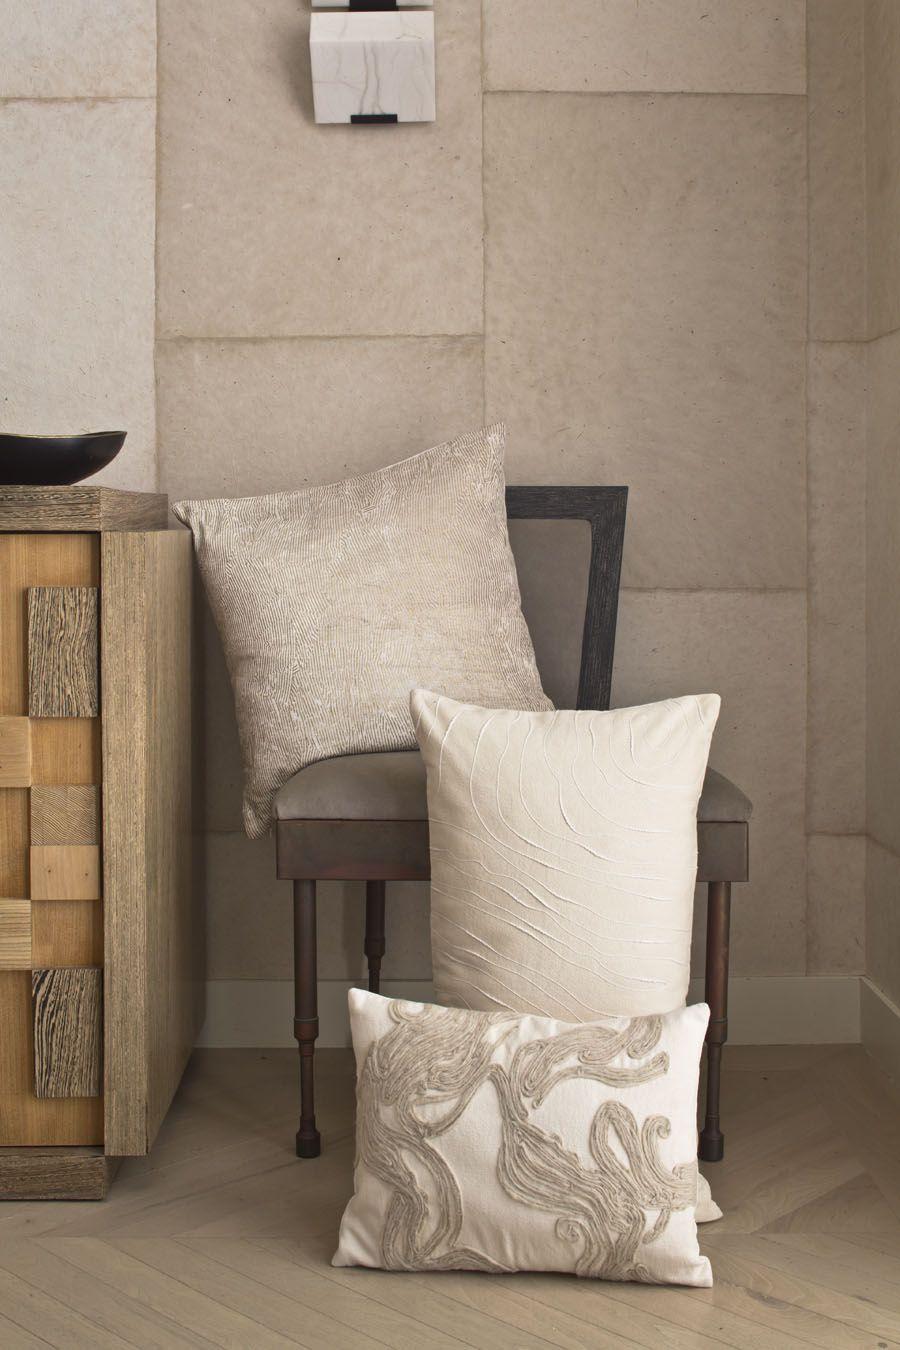 kelly wearstler | dune bedding. decorative pillows. | calmly